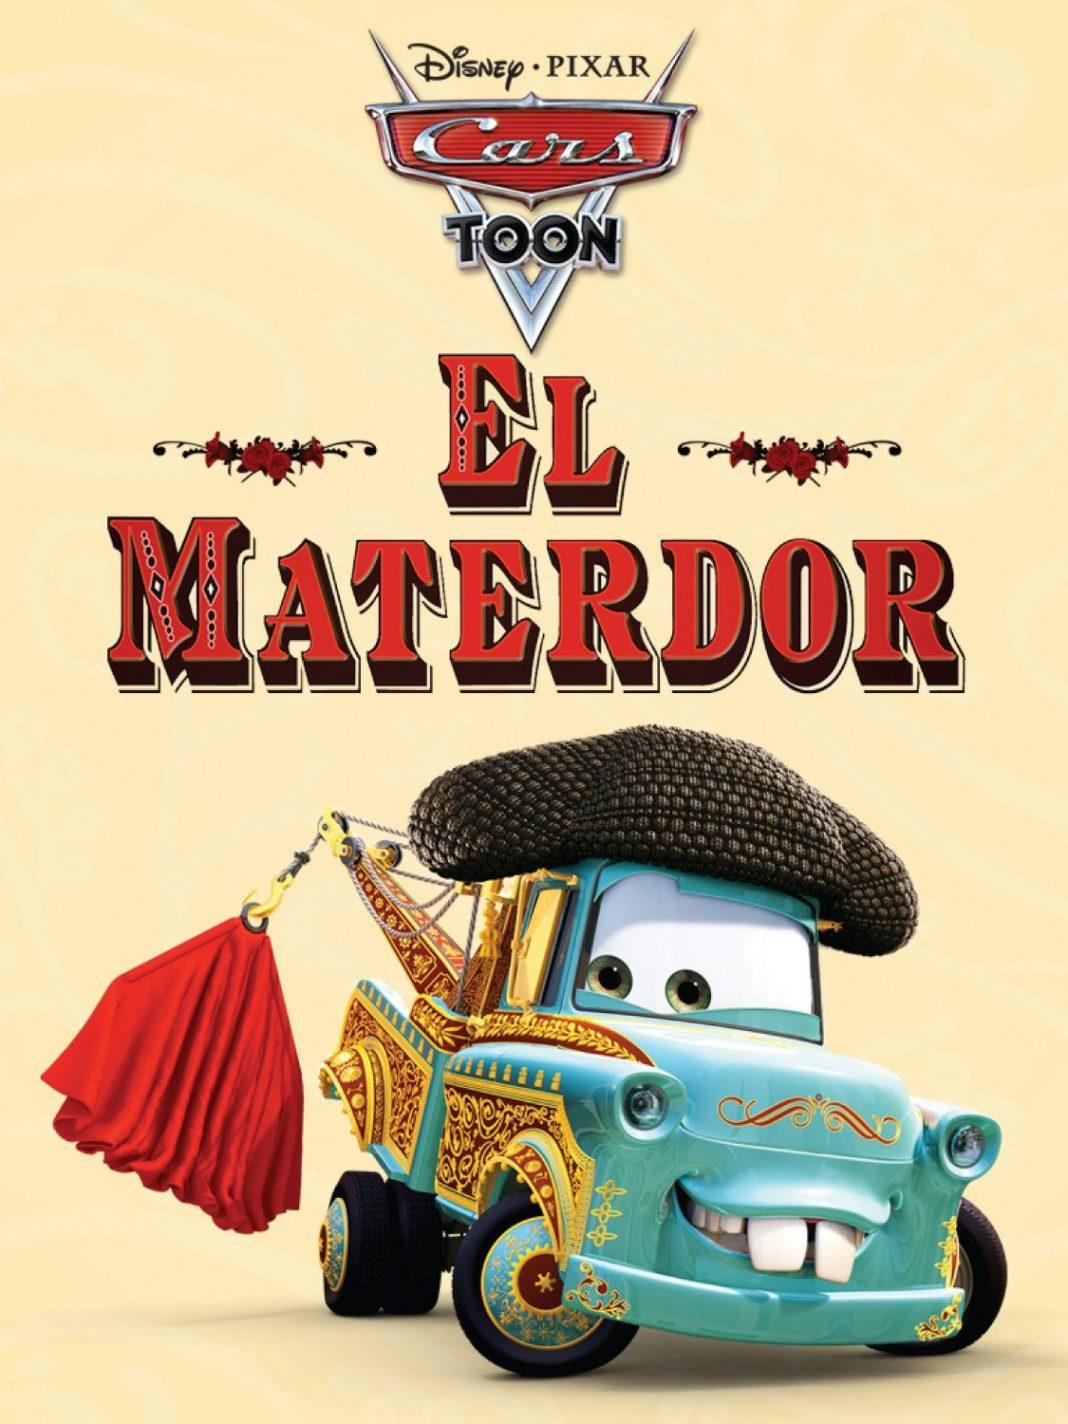 Pixar disney cars toon el martindor materdor affiche poster